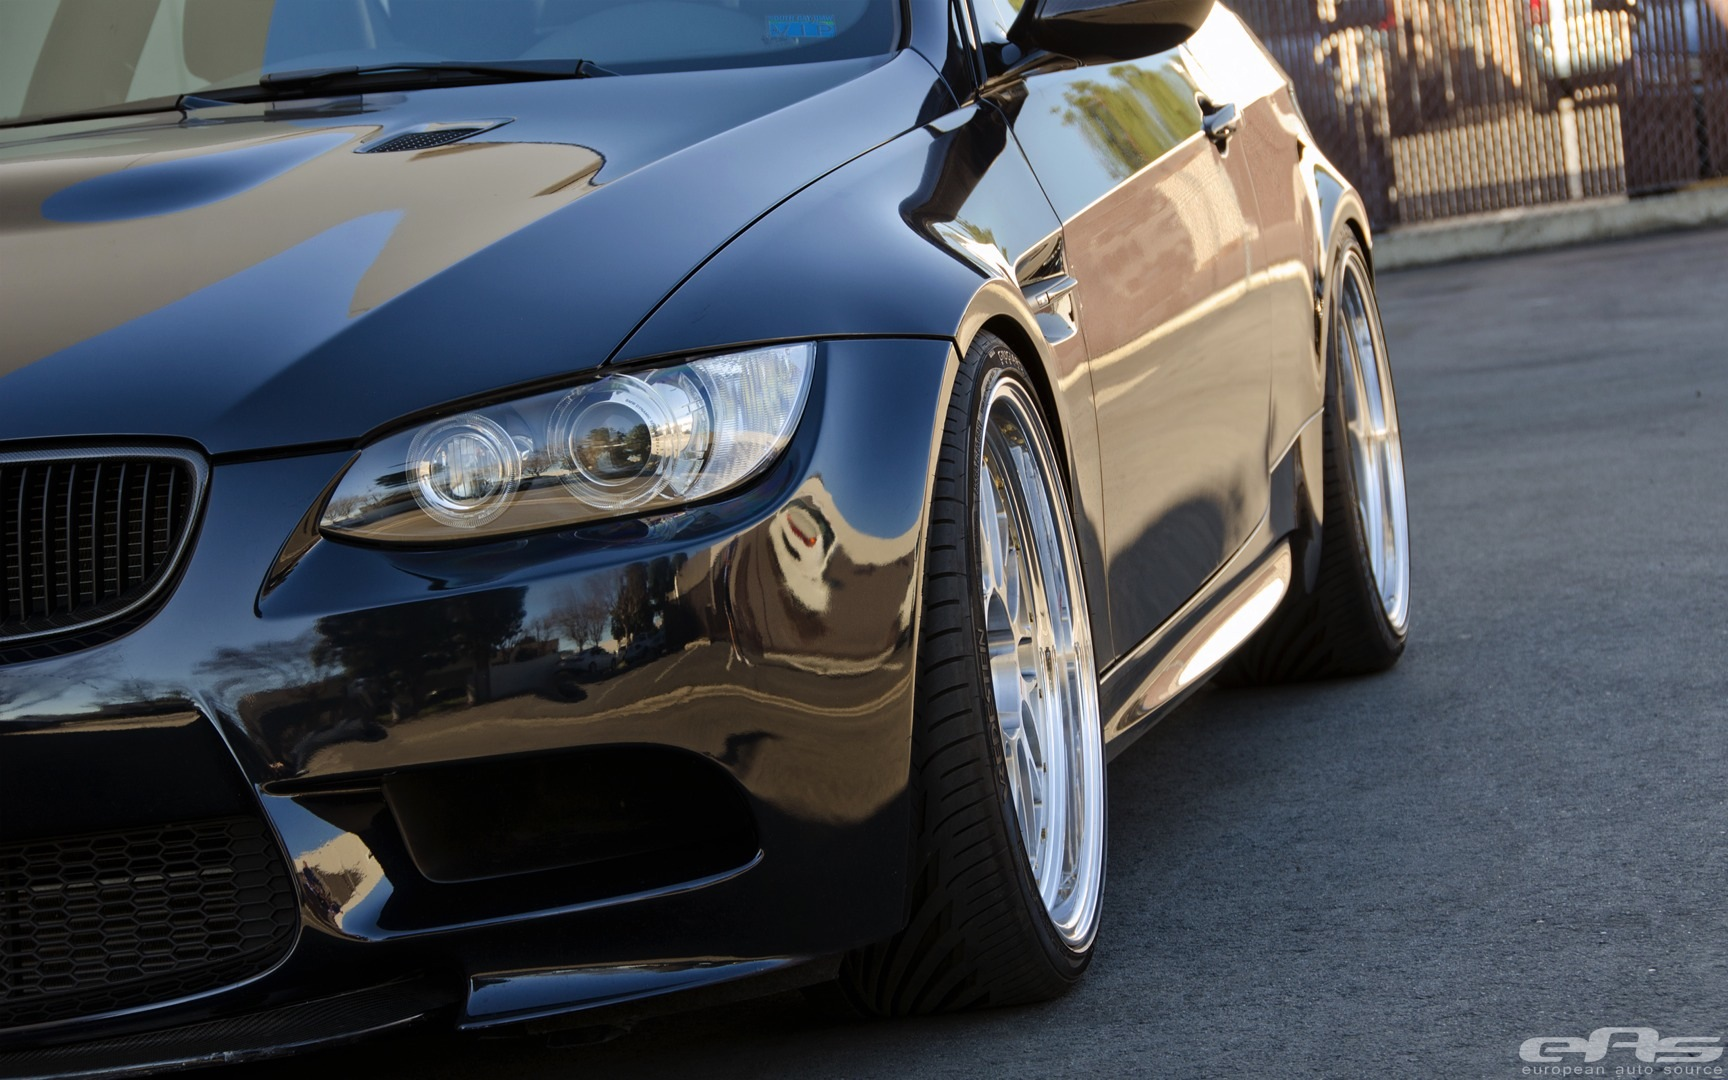 Jerez Black Bmw E92 M3 Gets Serious Upgrades Autoevolution